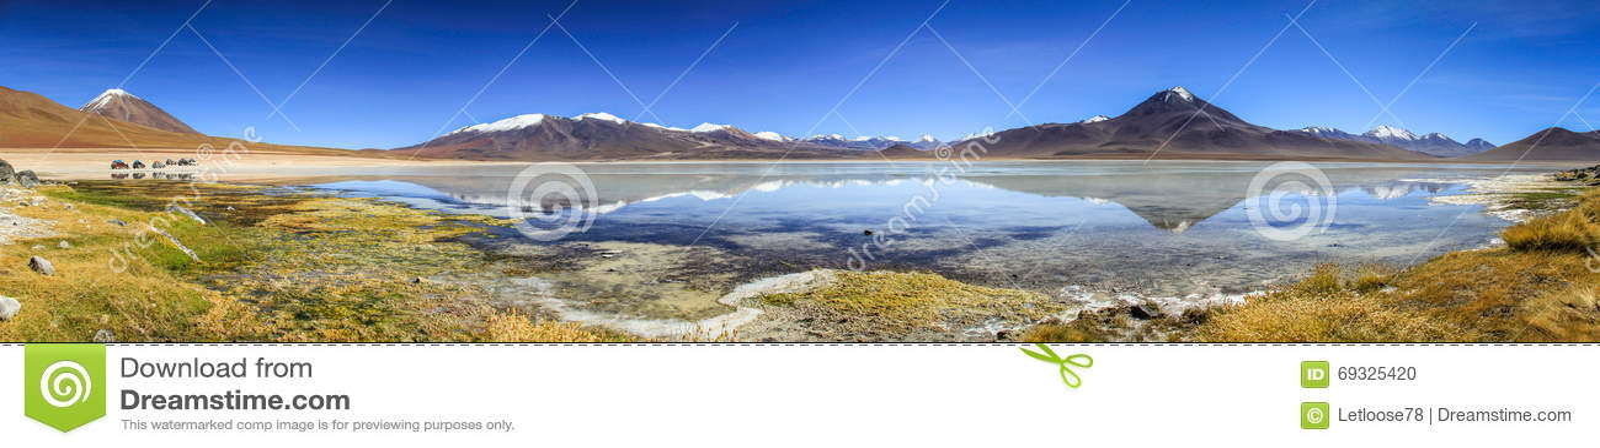 Laguna Blanca Reflections Panorama, Altiplano, Bolivia,